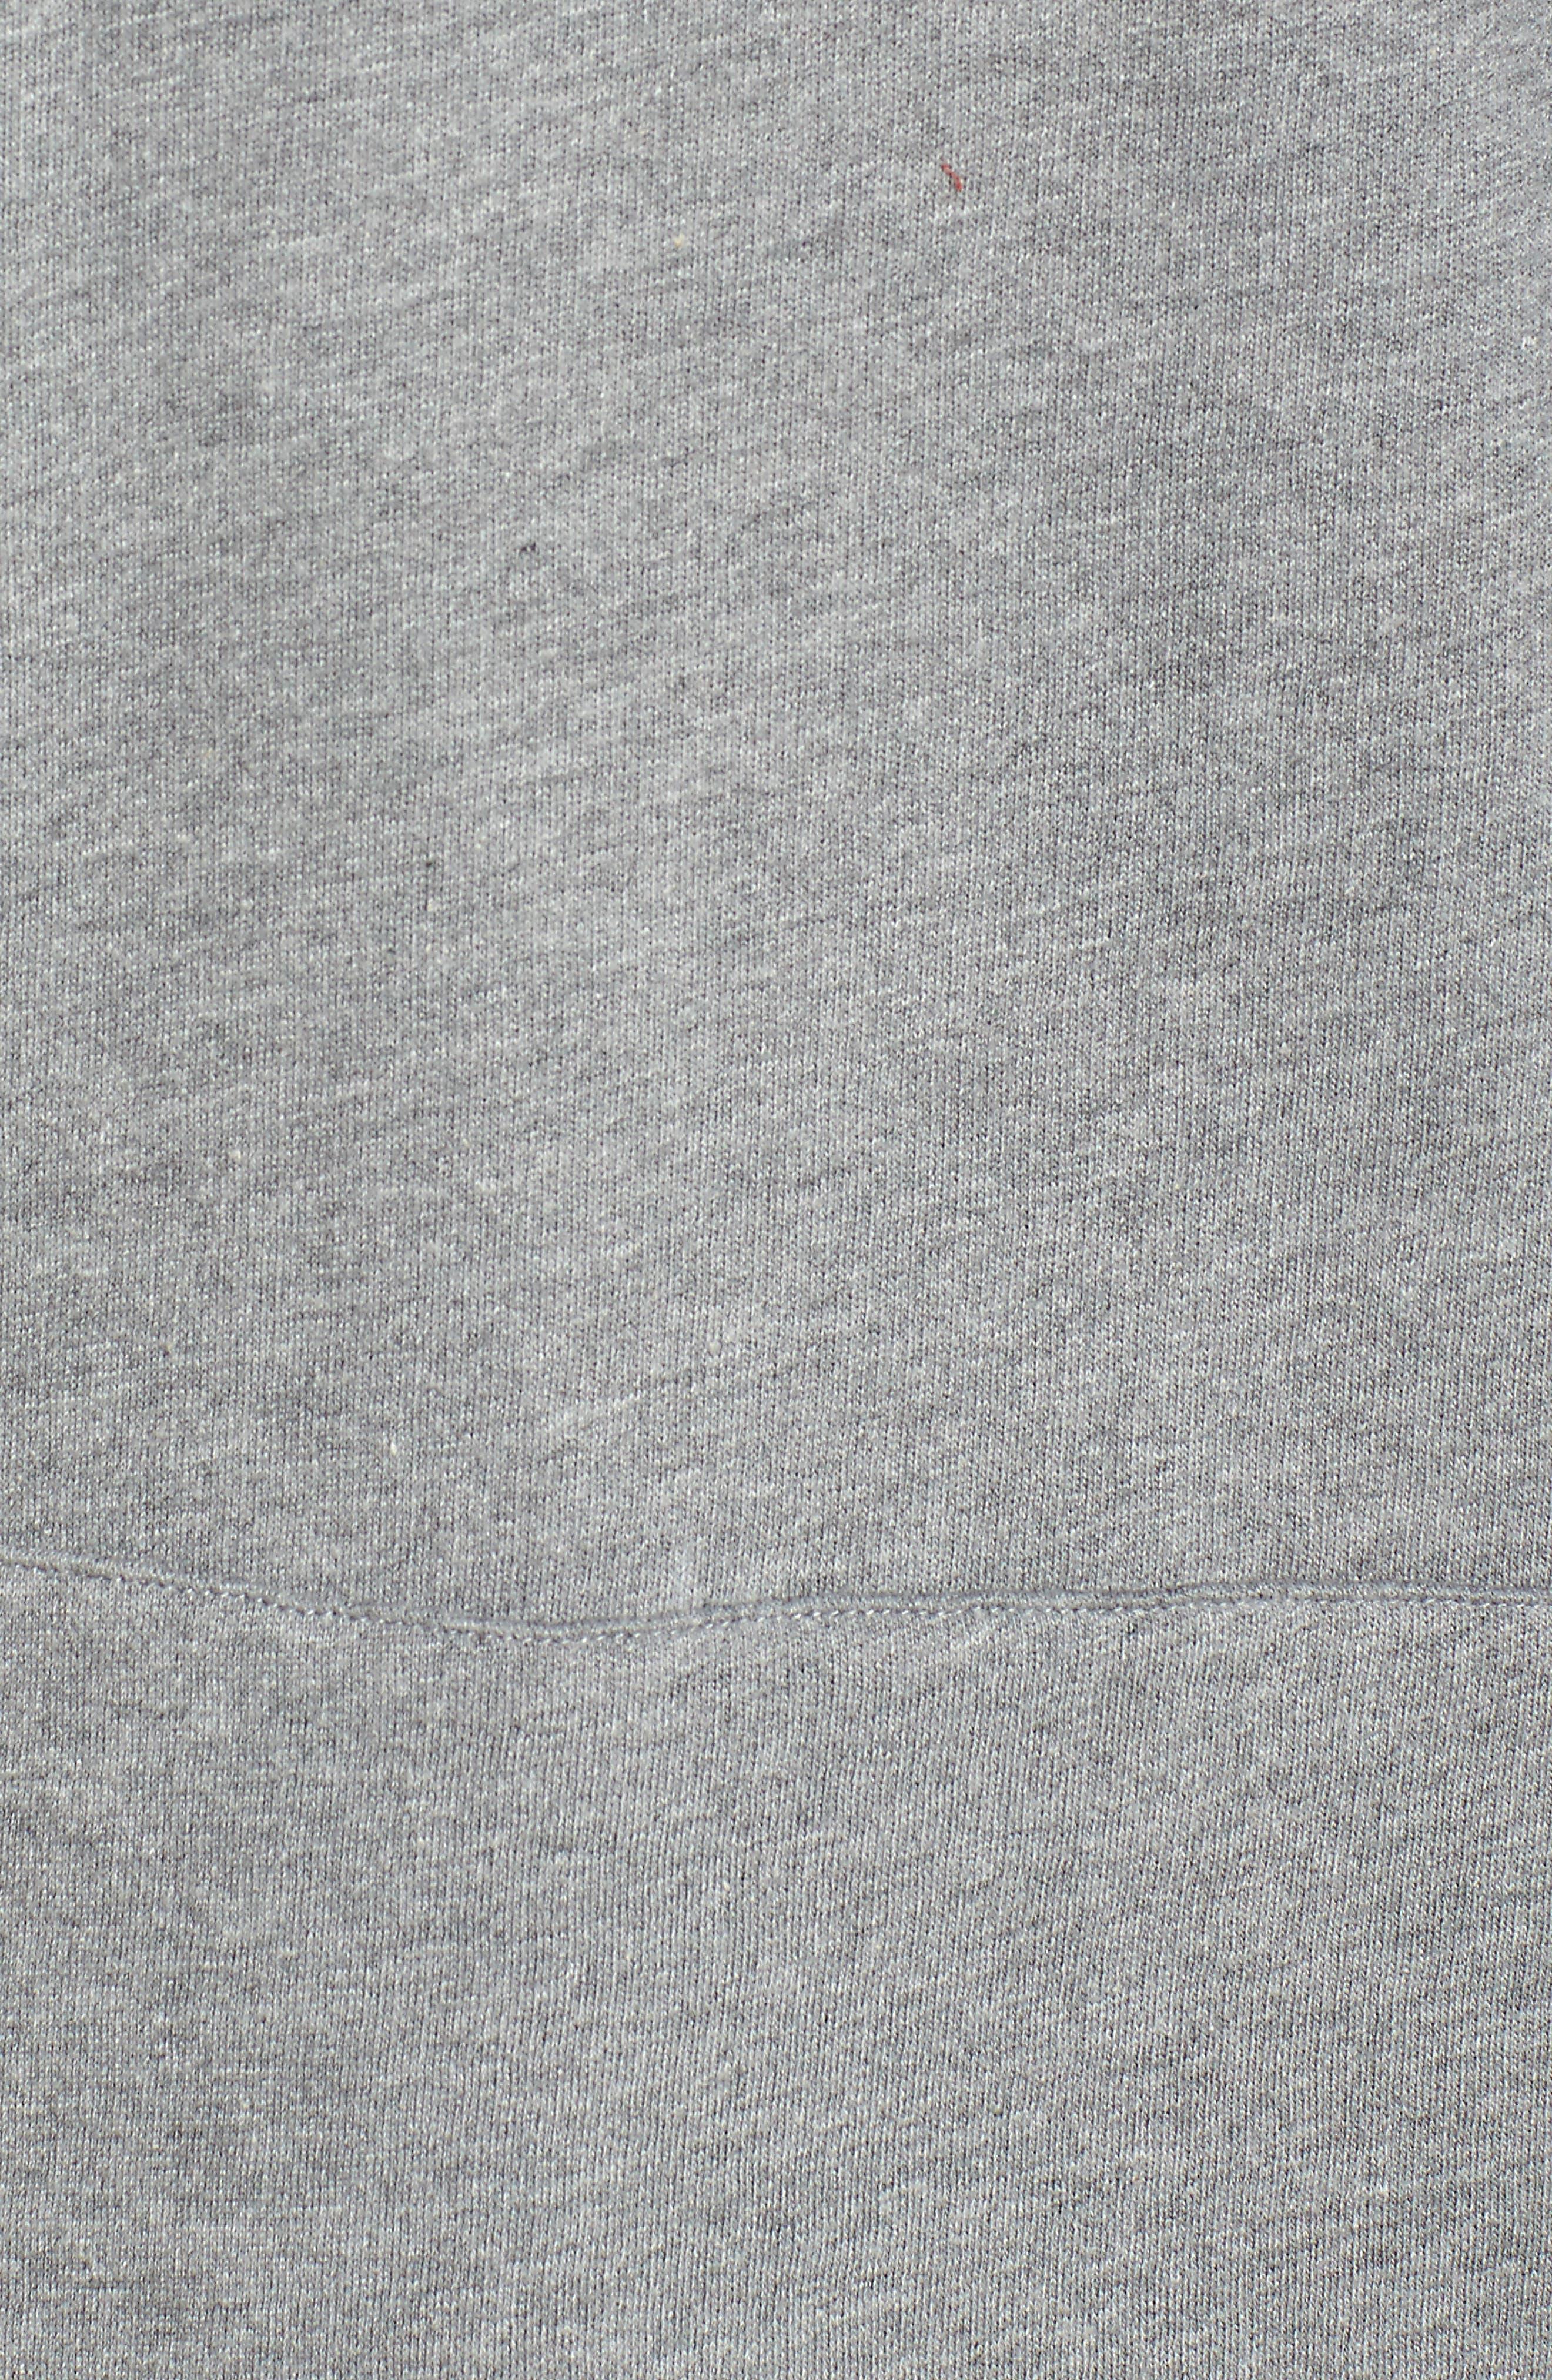 Blonde Sweatshirt Dress,                             Alternate thumbnail 5, color,                             Heather Grey White